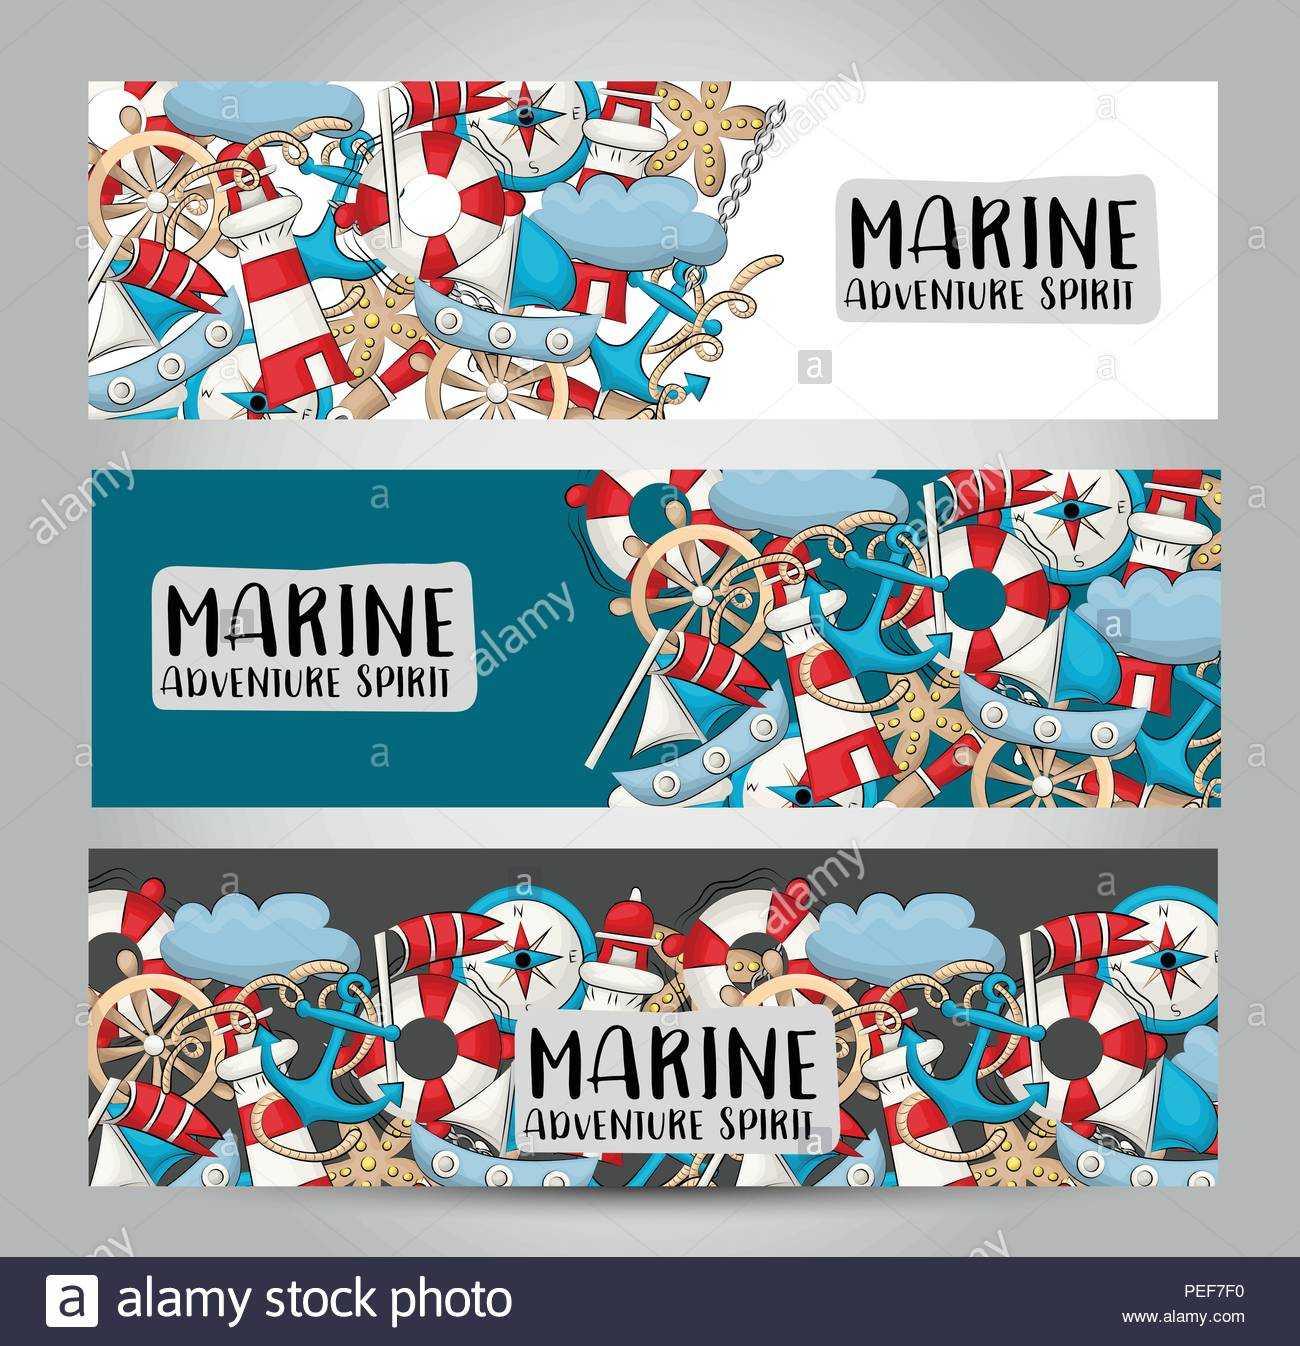 Marine Nautical Travel Concept. Horizontal Banner Template Throughout Nautical Banner Template